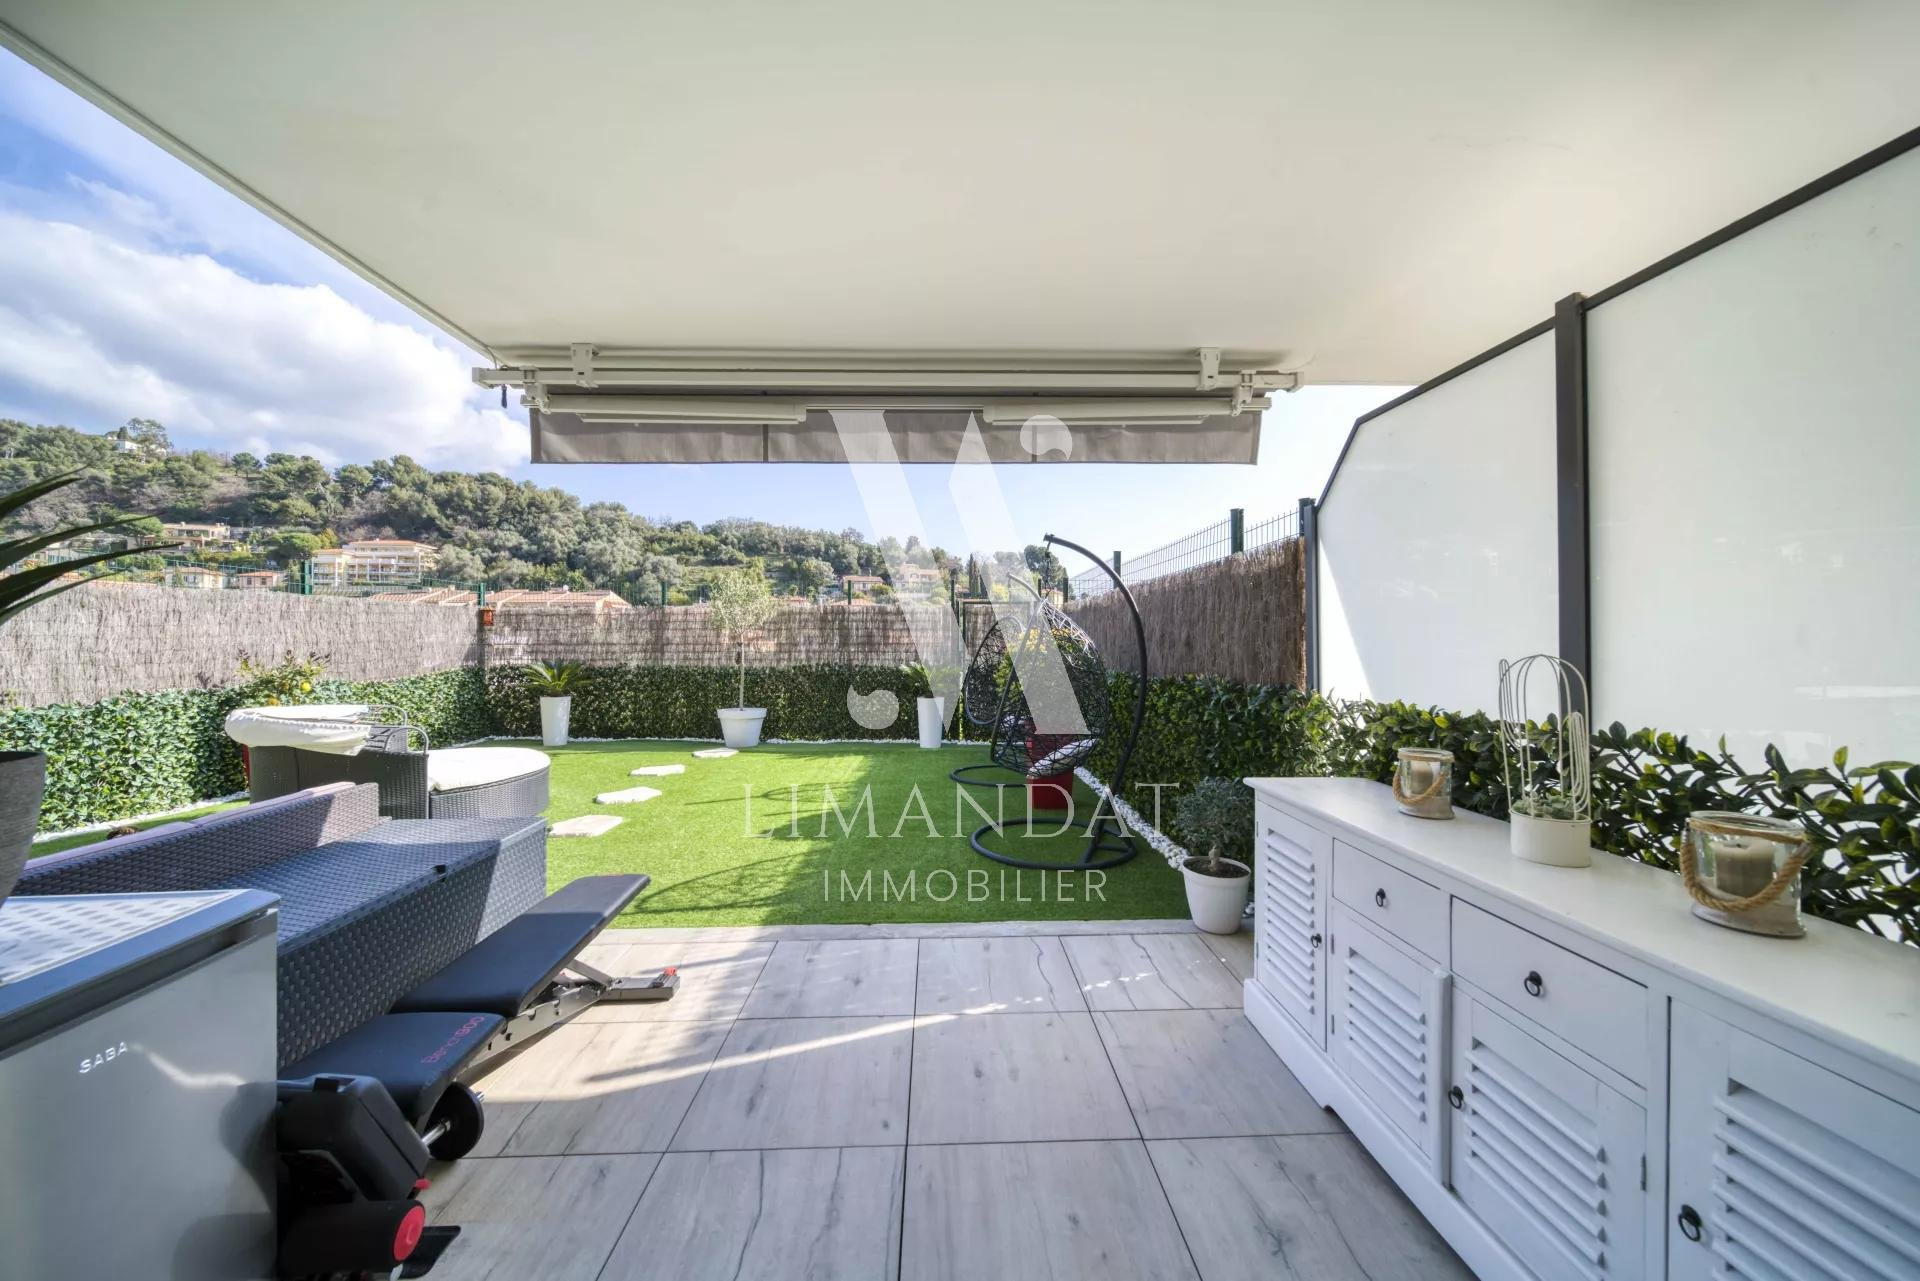 Roquebrune Cap Martin - 3 pièces 69 m2 terrasse 34 m2 jardin 44 m2 garage